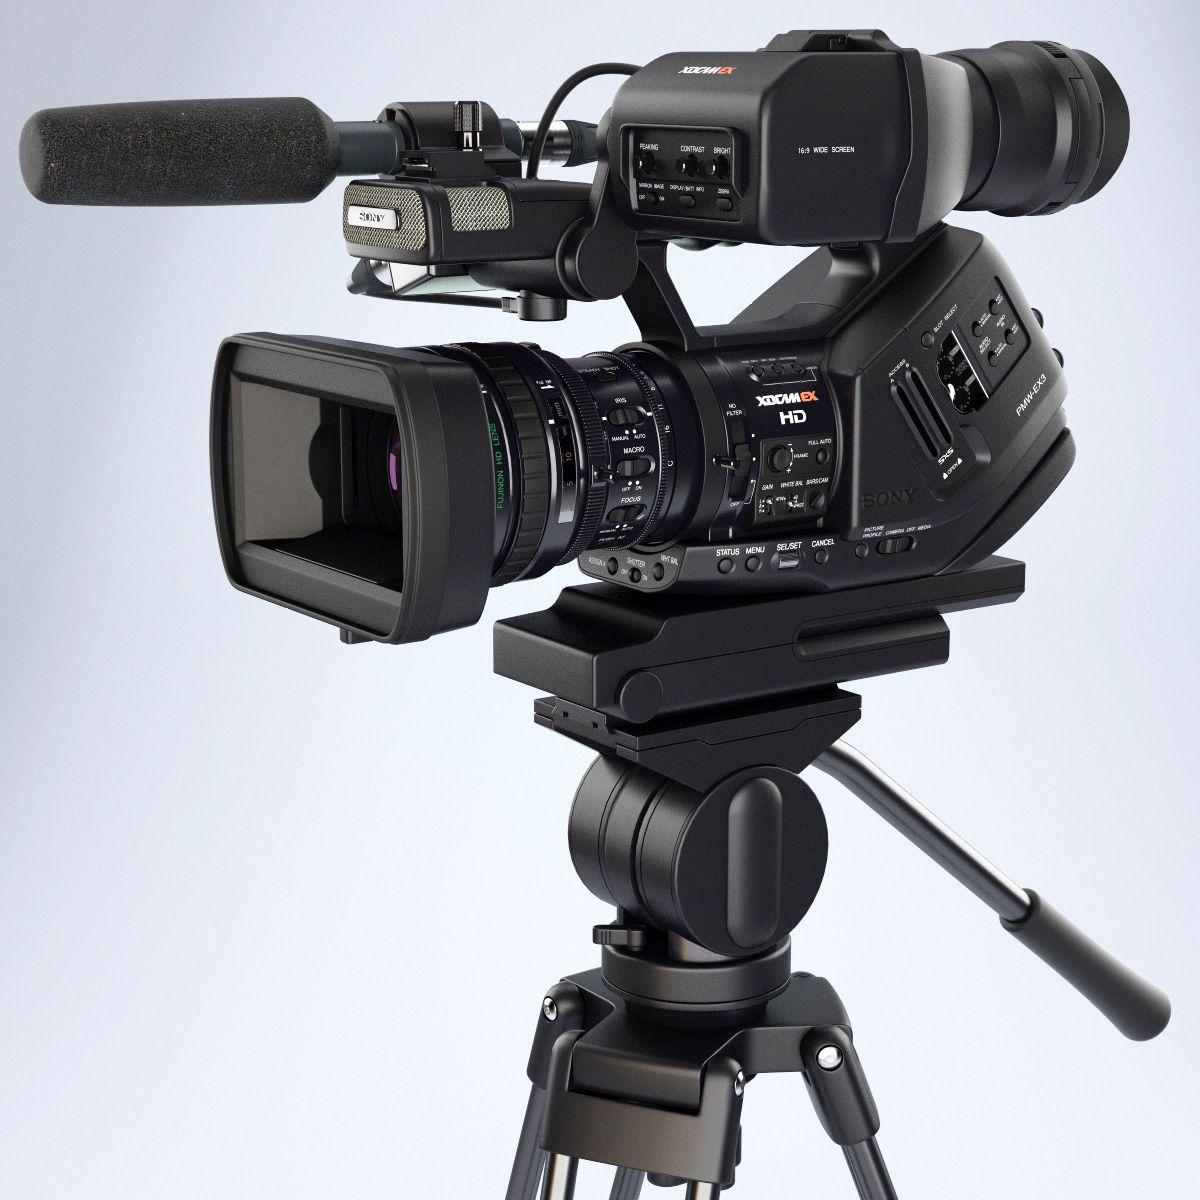 Sony XDCAM-EX HDCAM camera visualization on Behance